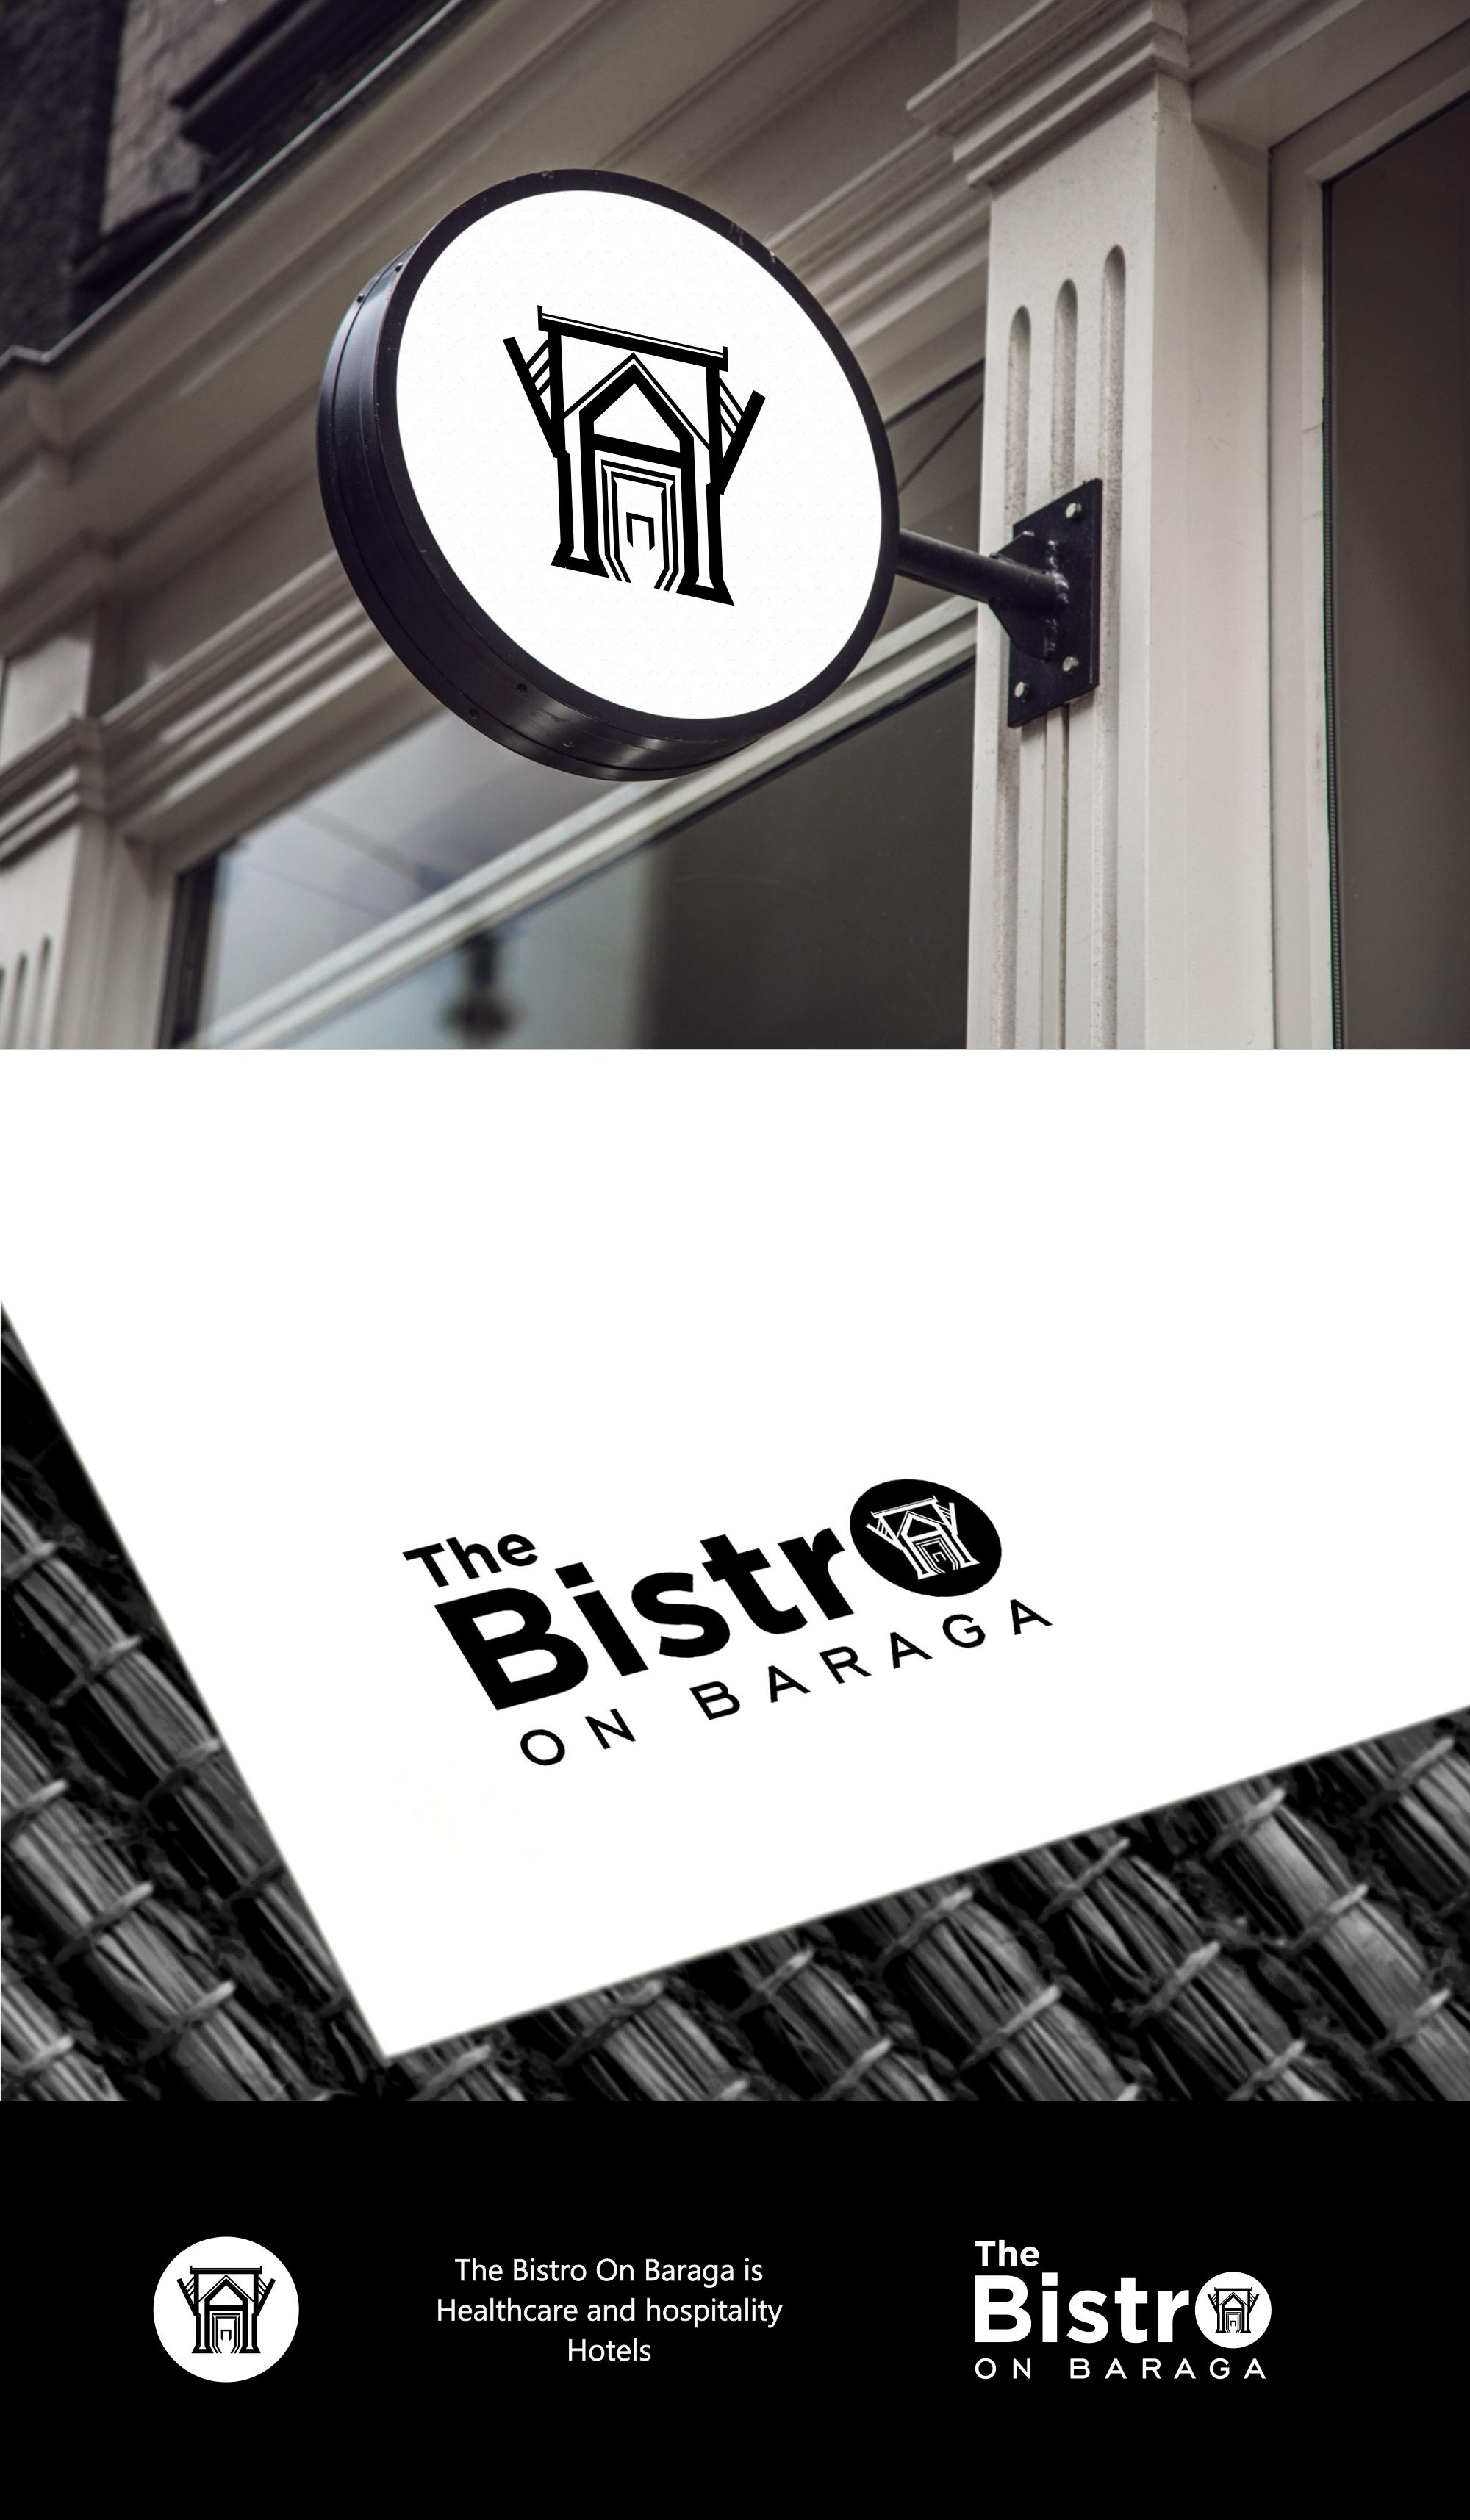 The Bistro on Baraga